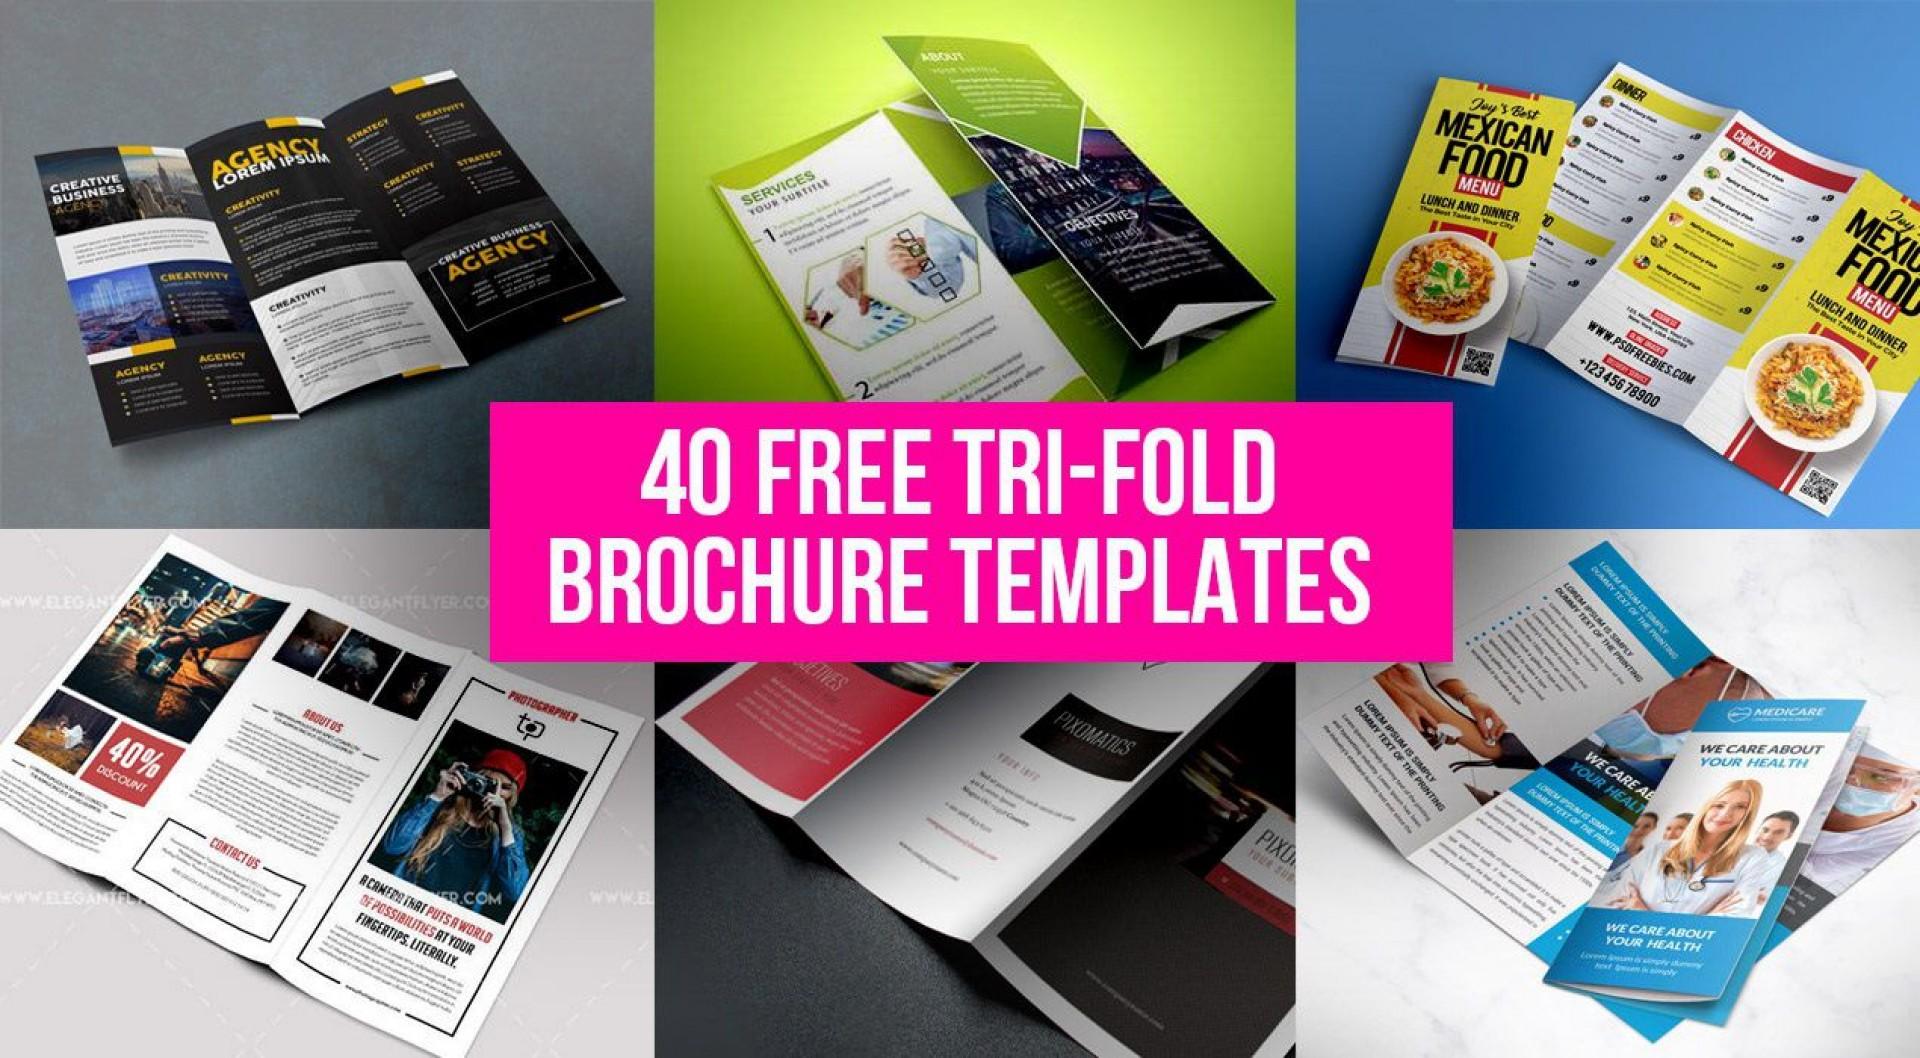 000 Beautiful Free Tri Fold Brochure Template Sample  Photoshop Illustrator Microsoft Word 20101920